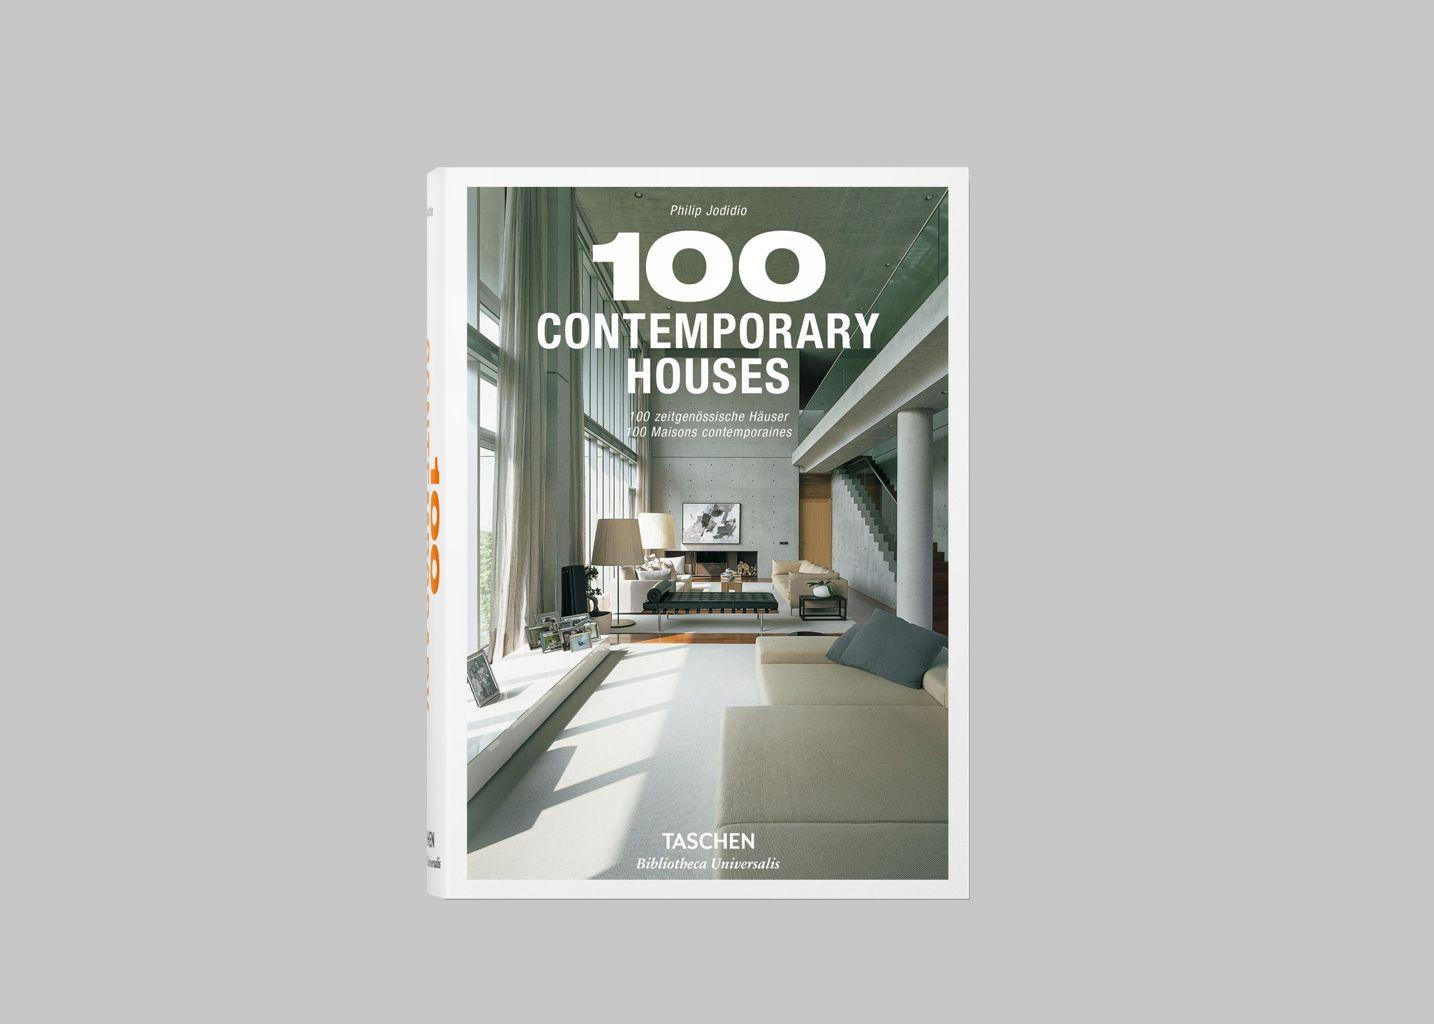 100 Contemporary Houses  - La Librairie